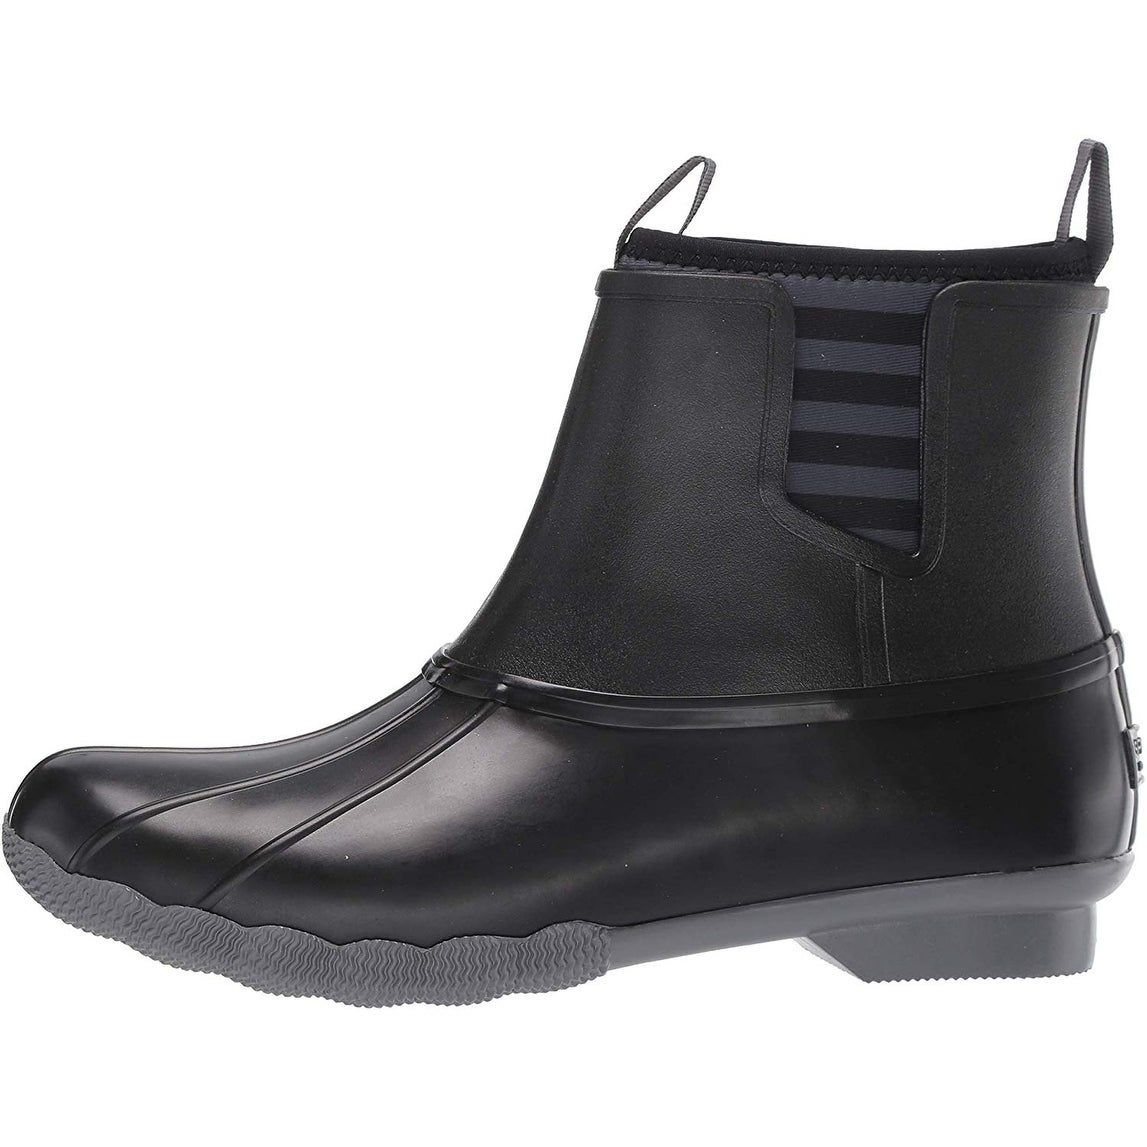 Sperry Women's Shoes Saltwater Chelsea